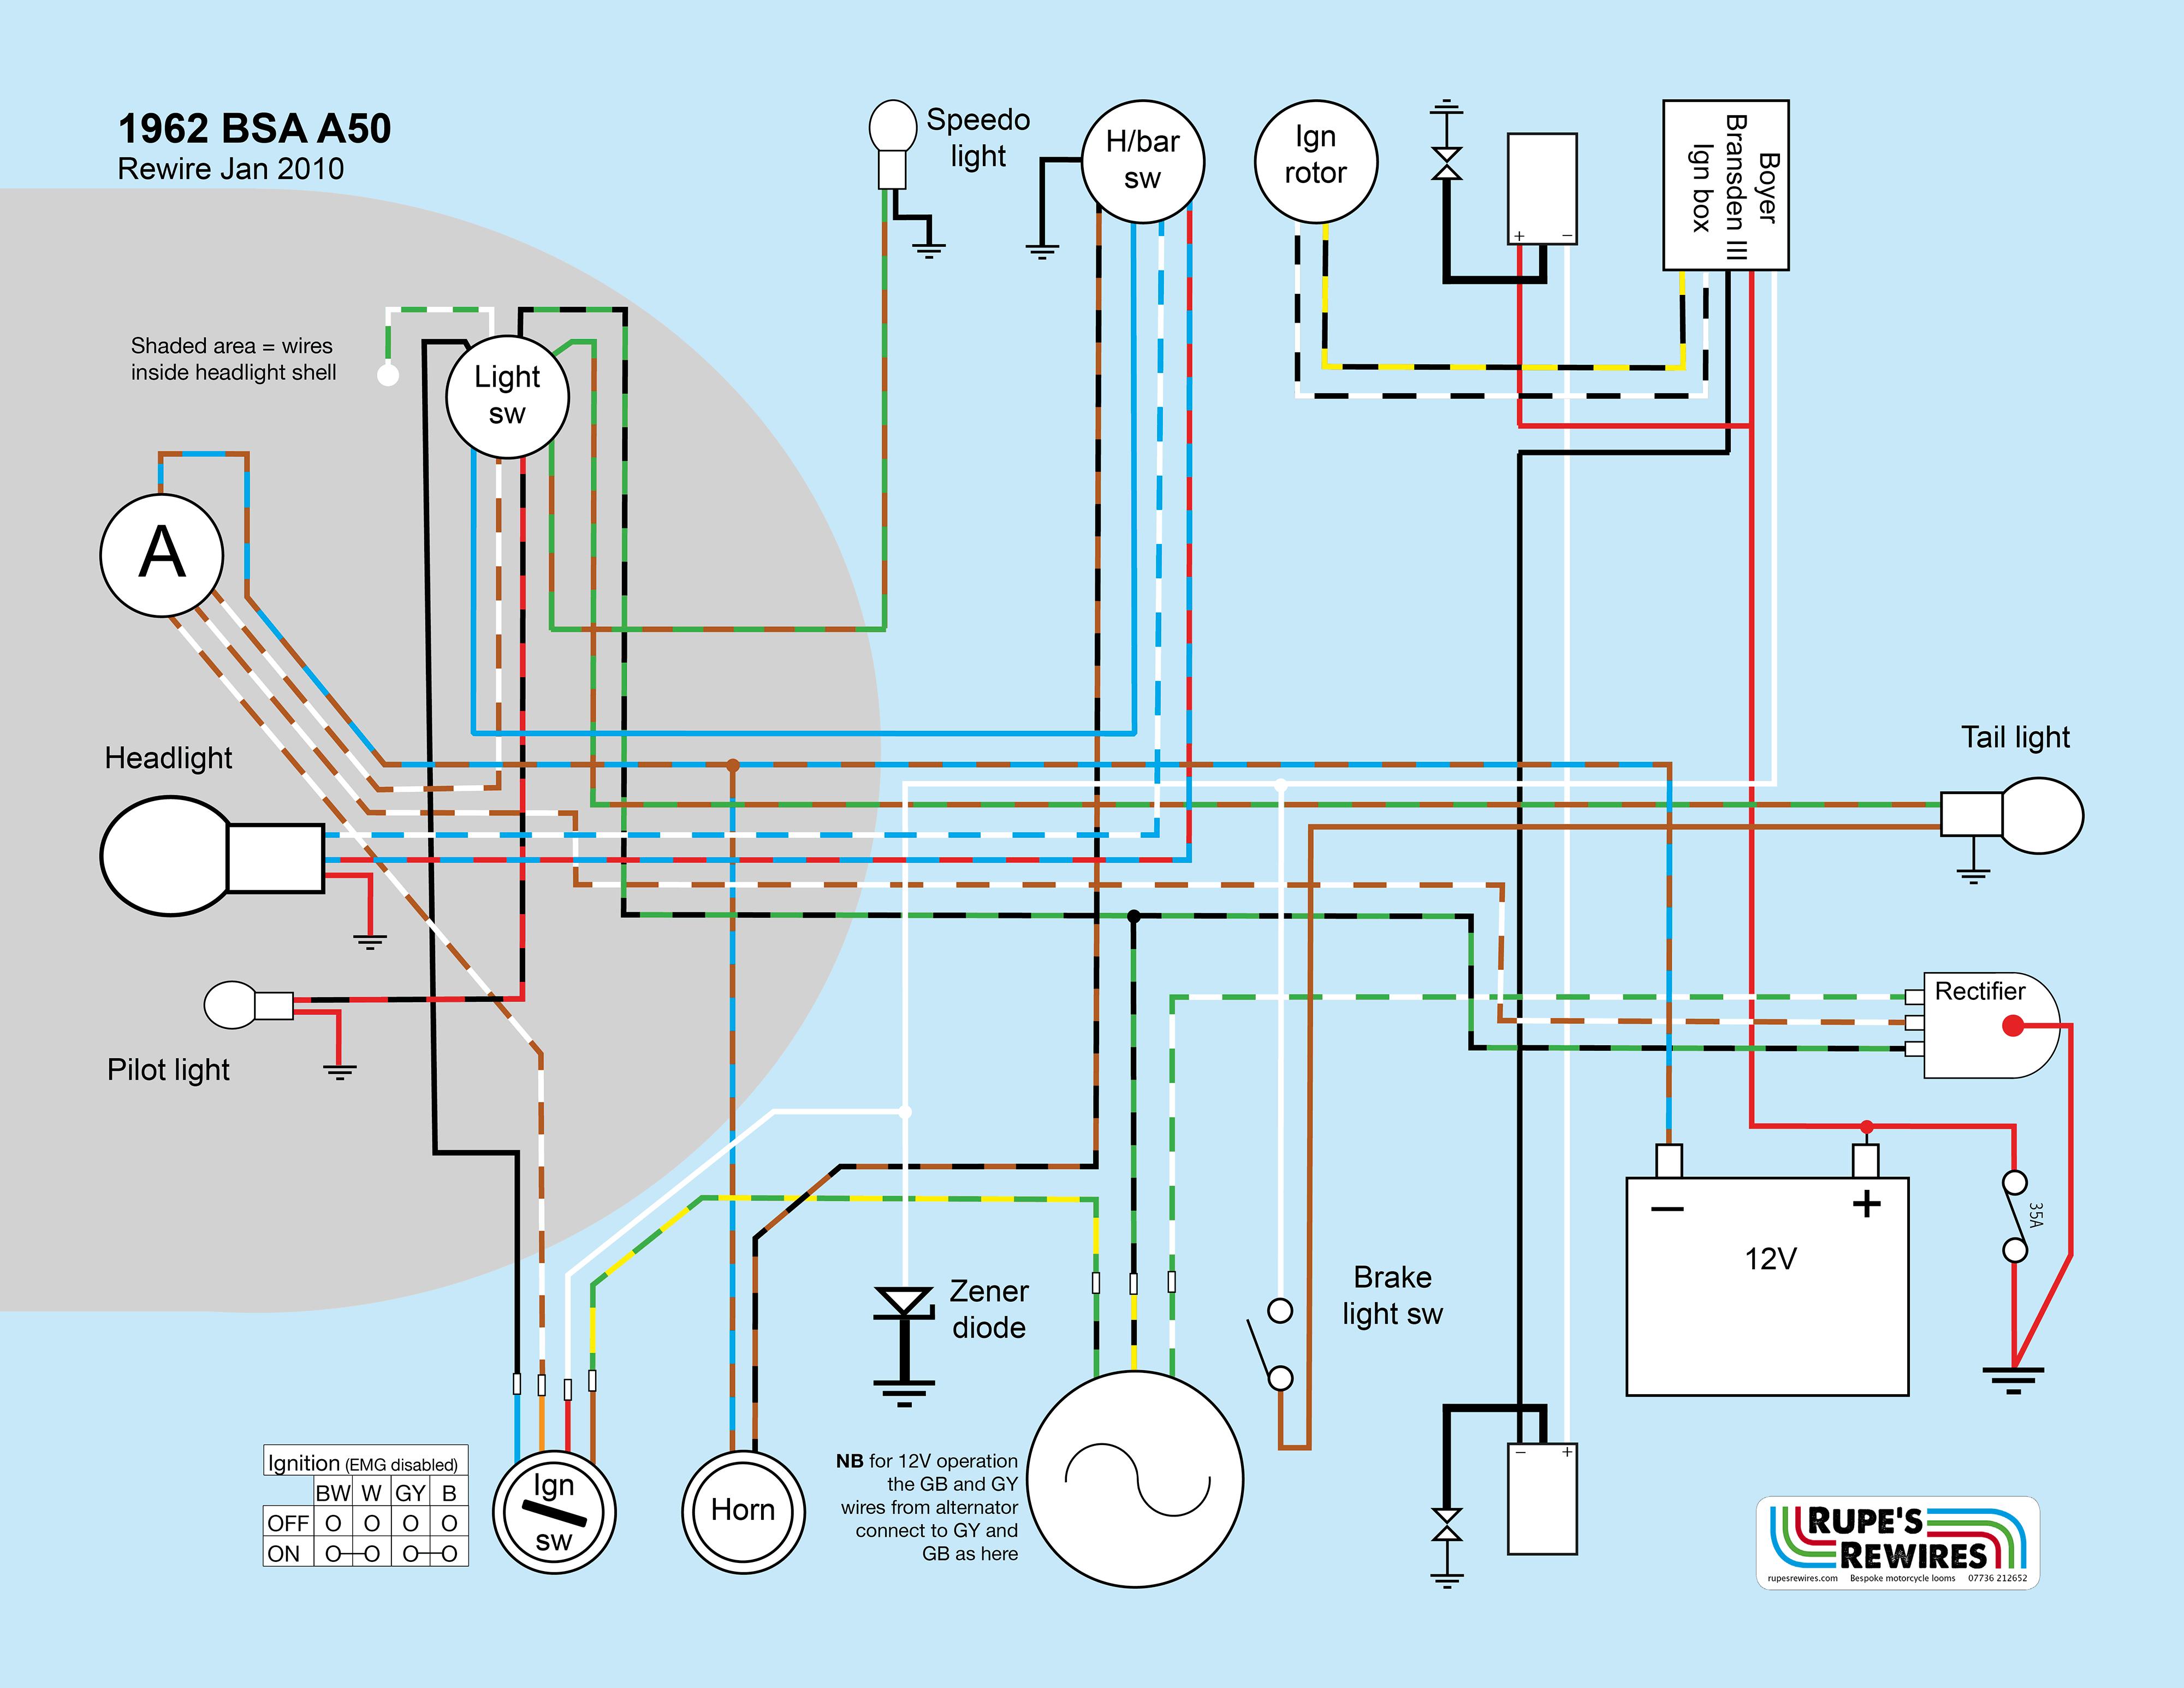 Bsa A50 Wiring Diagram Great Design Of 1962 Triumph Stator Loom Rh Rupesrewires Com Motorcycle Diagrams Dual Coil